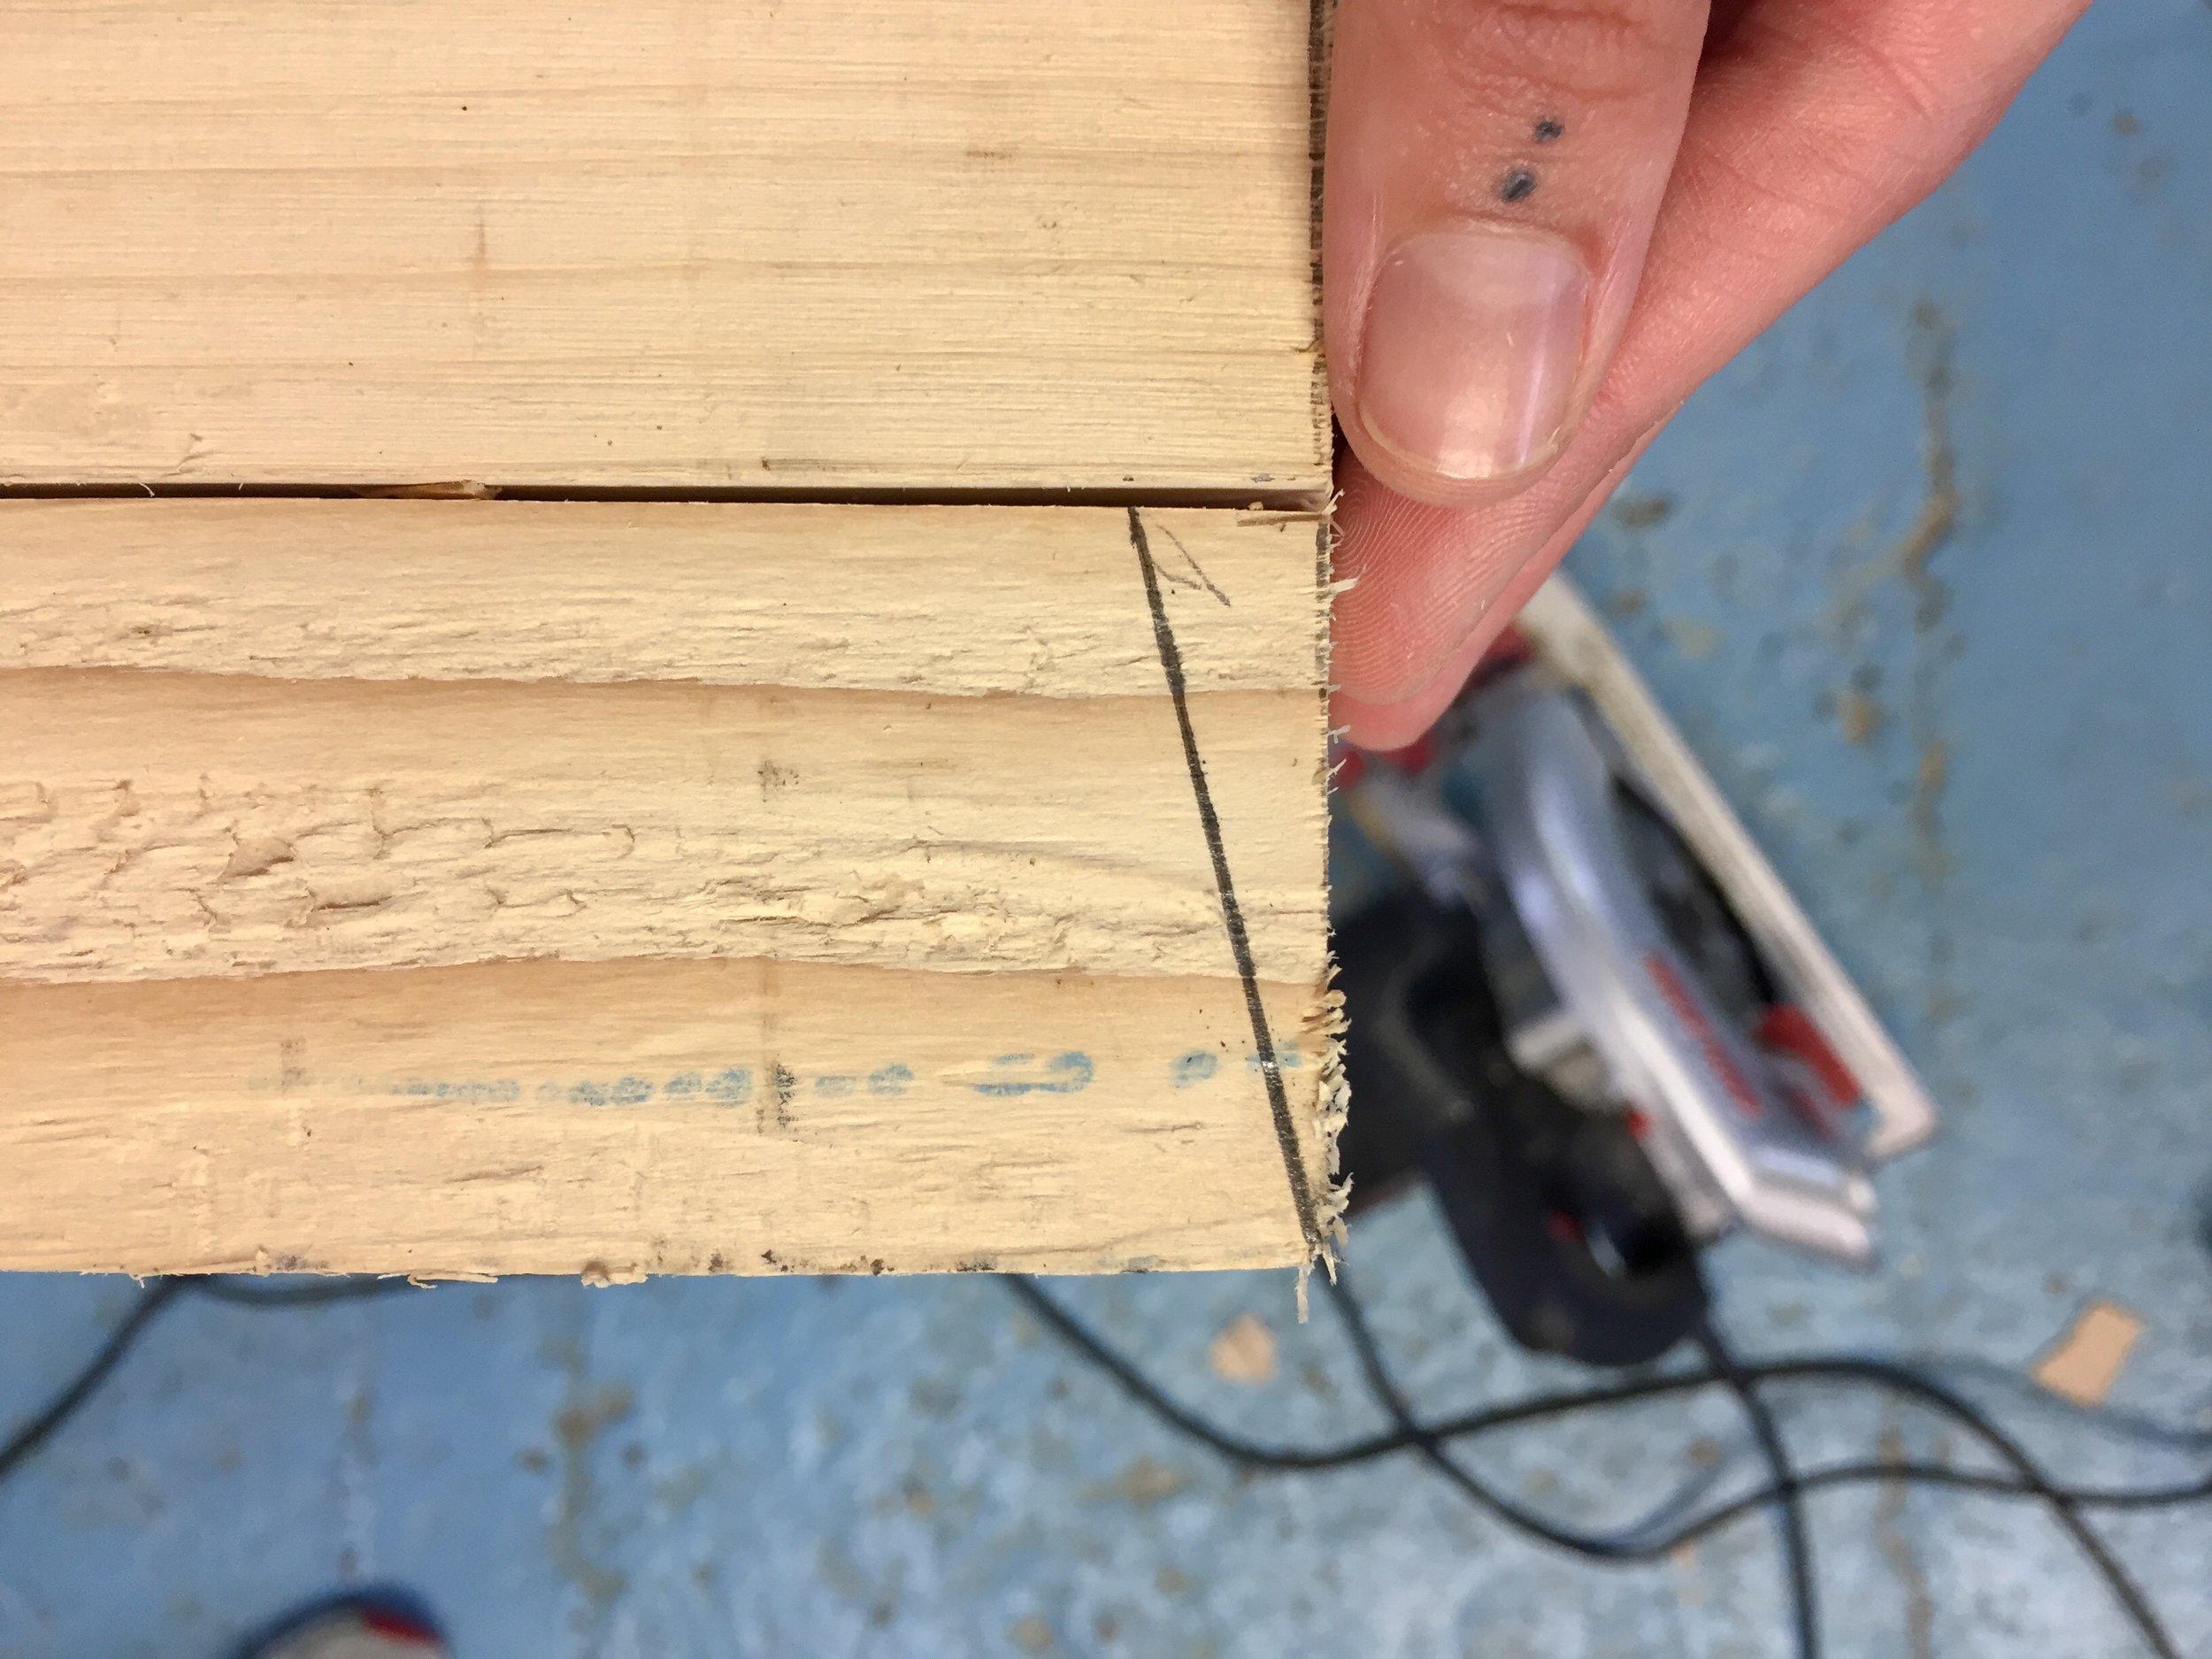 Measure 1 inch in a diagonal.